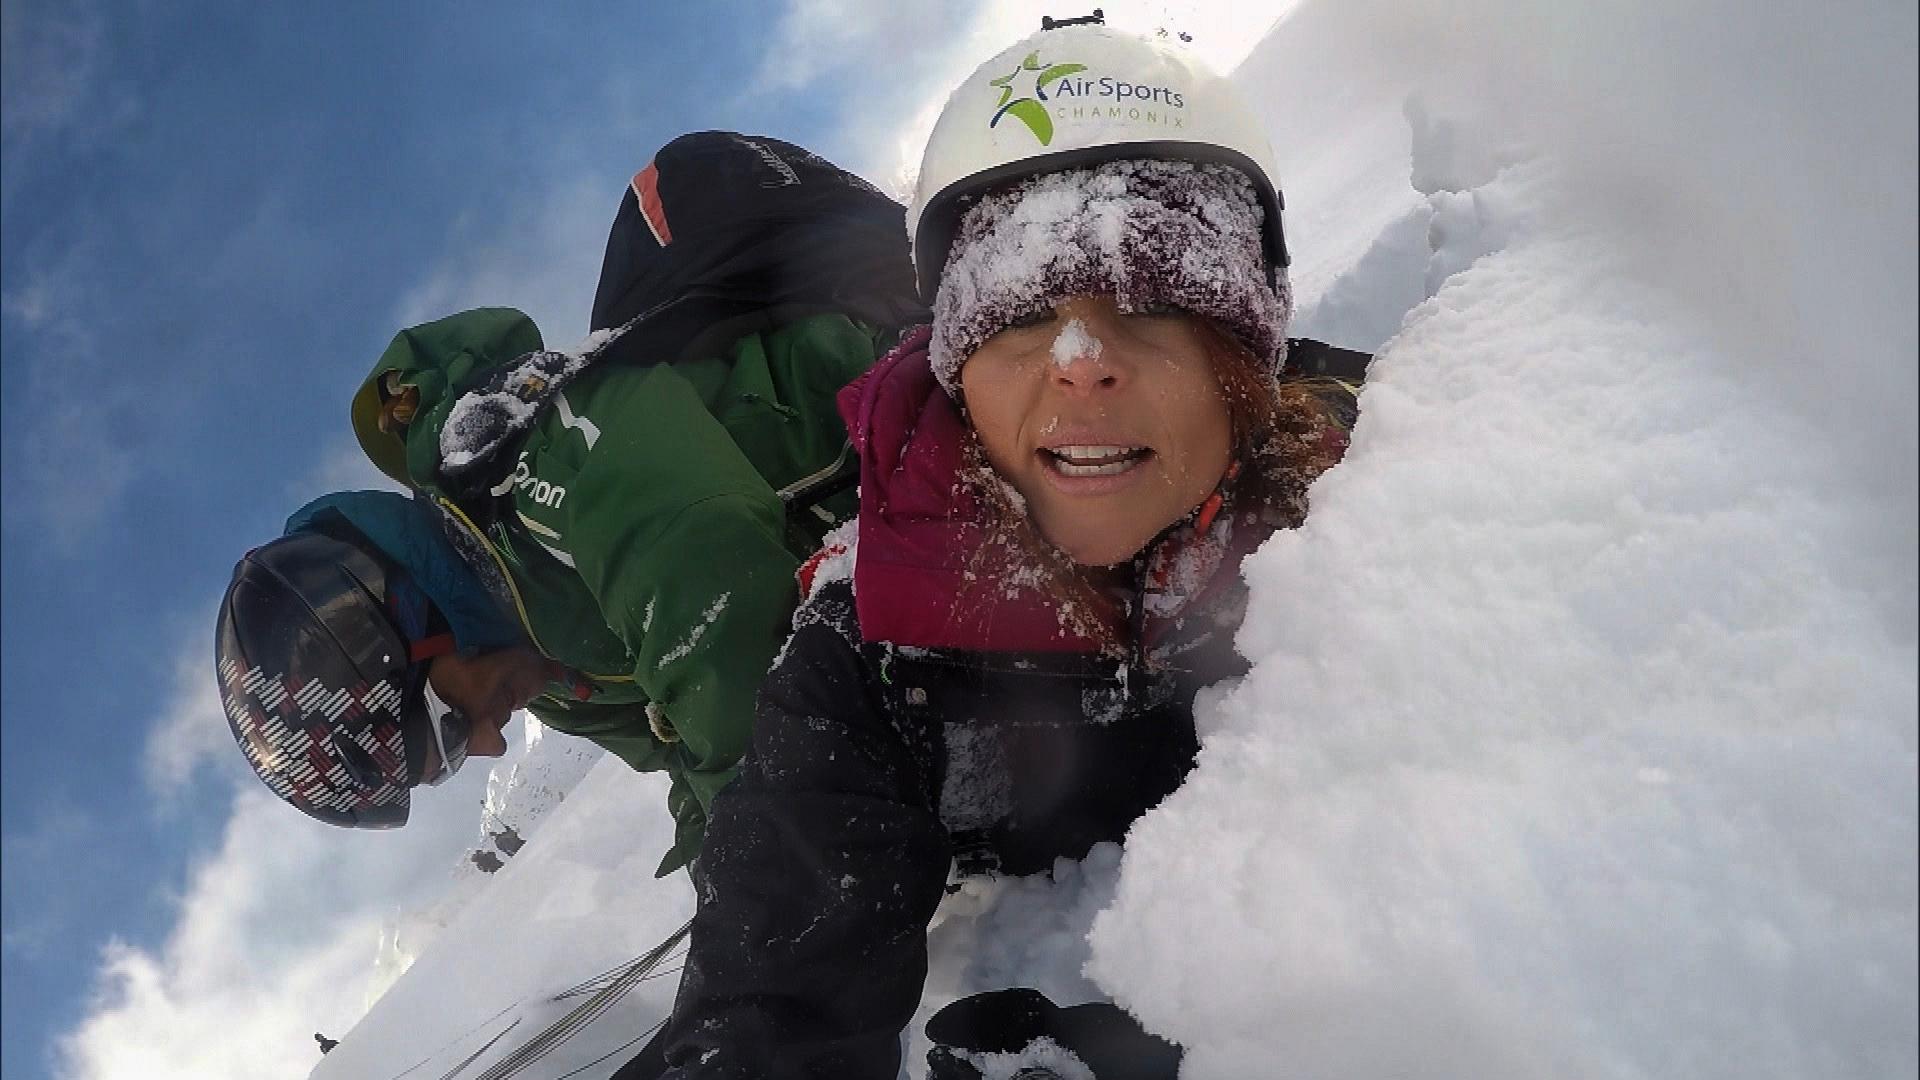 Erin must paraglide 7,000 feet over Chamonix in the Roadblock.